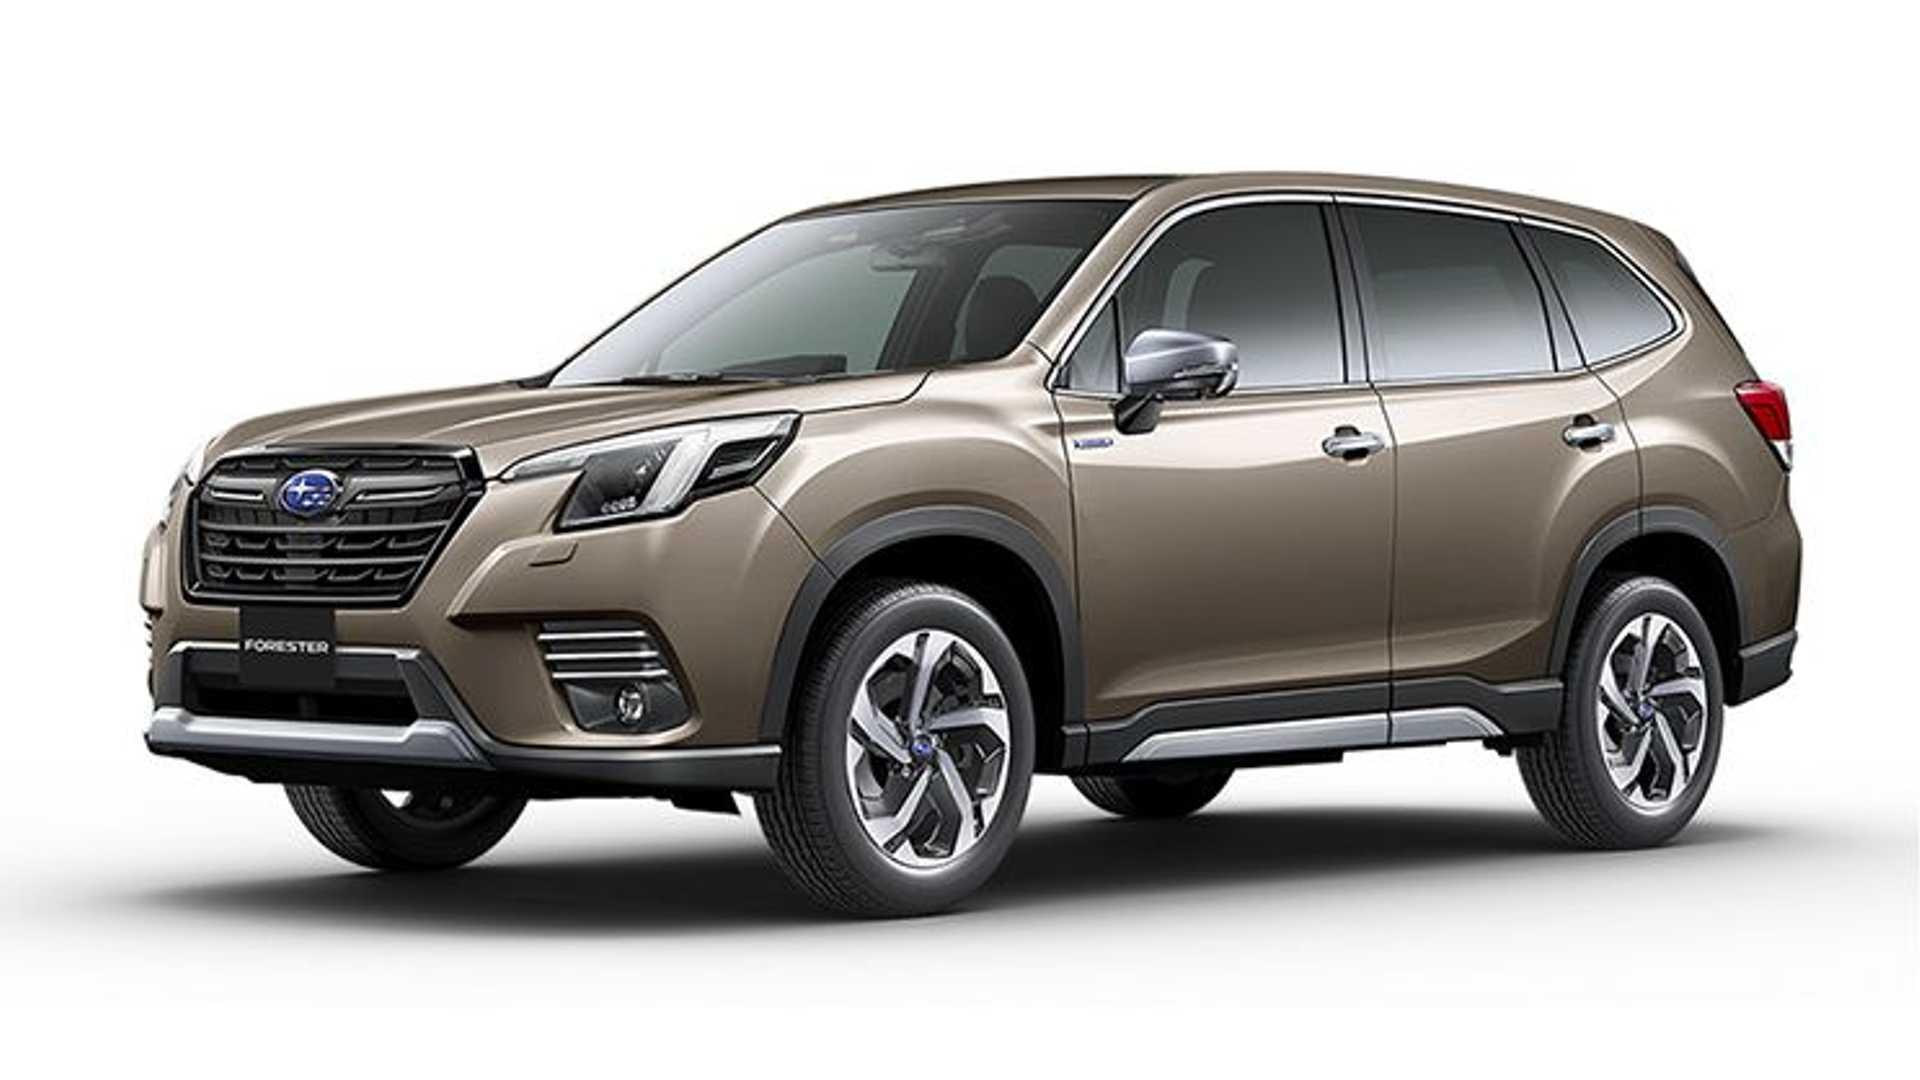 Subaru-Forester-facelift-7